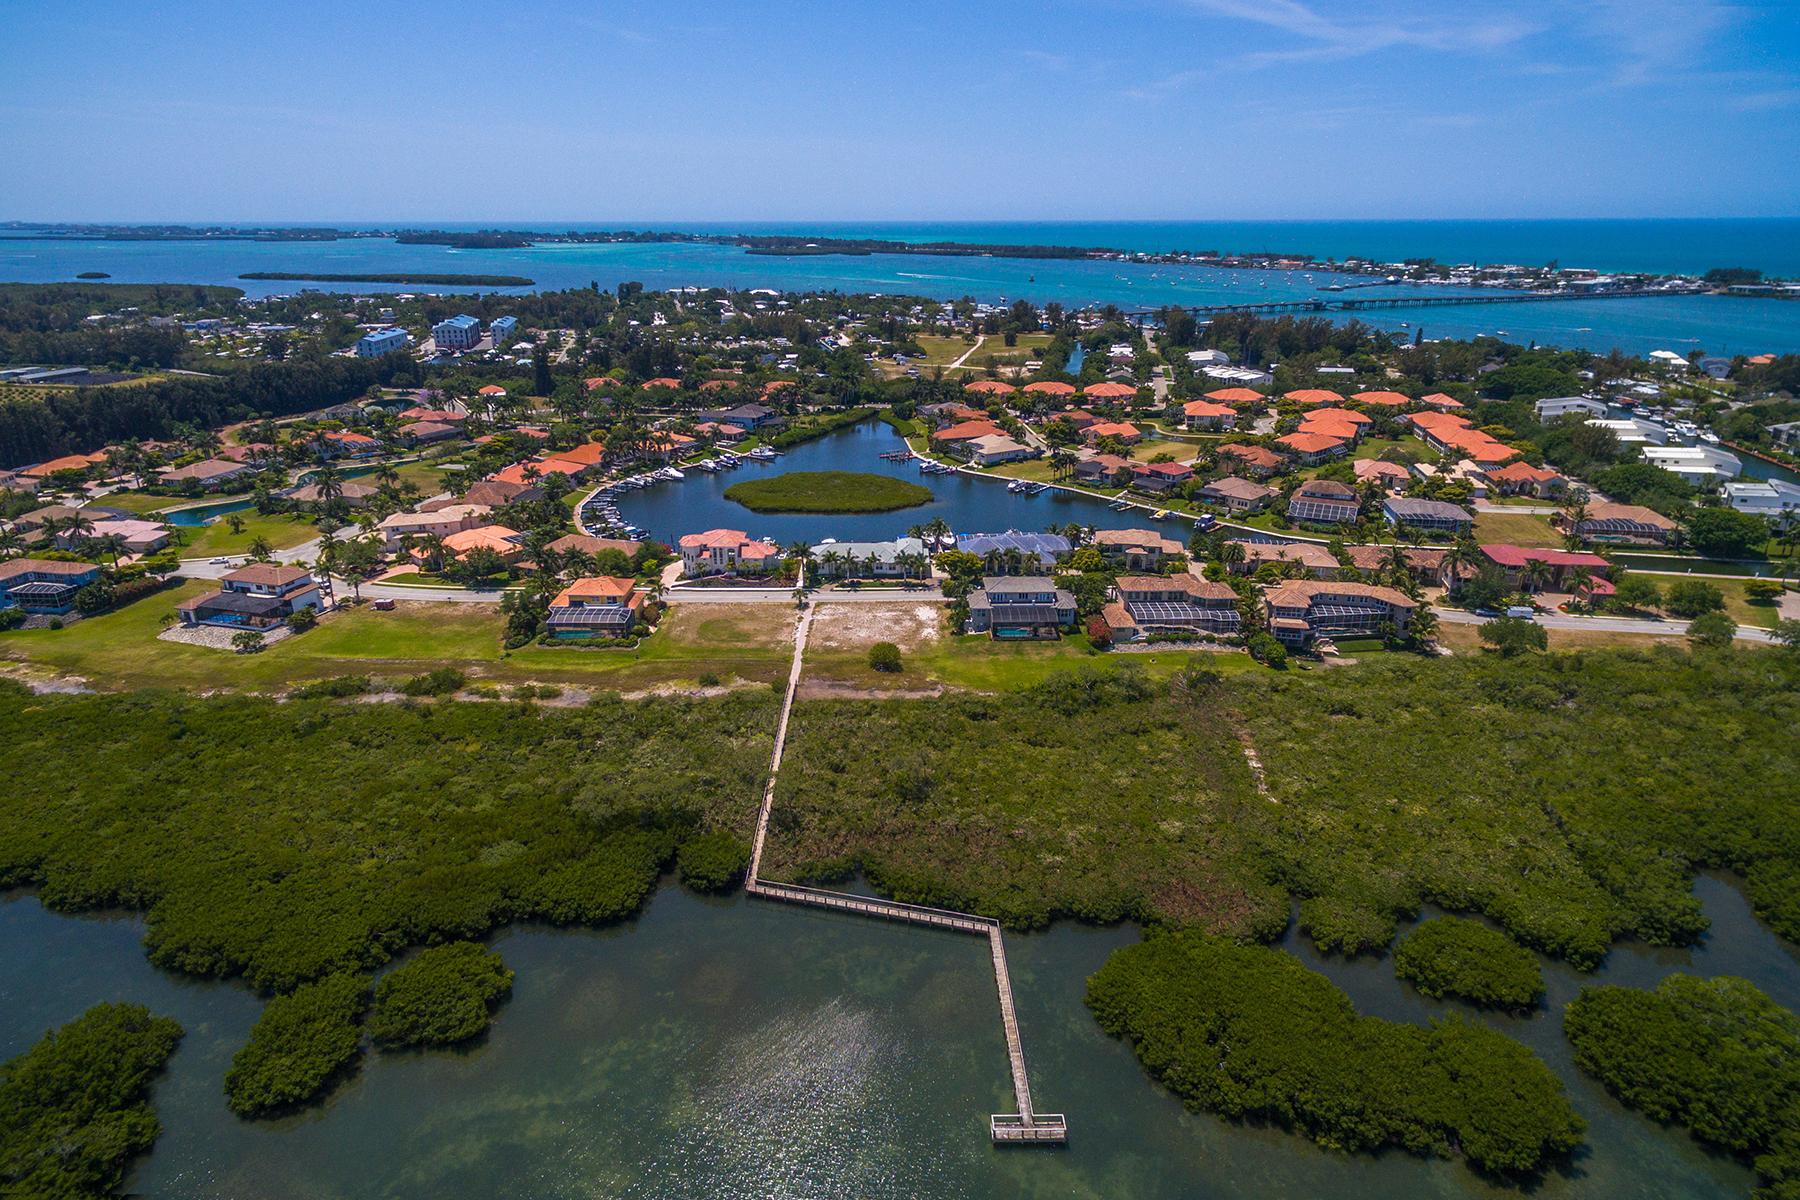 Land for Sale at HARBOUR LANDINGS ESTATES 12421 Baypointe Terr 28, Cortez, Florida, 34215 United States